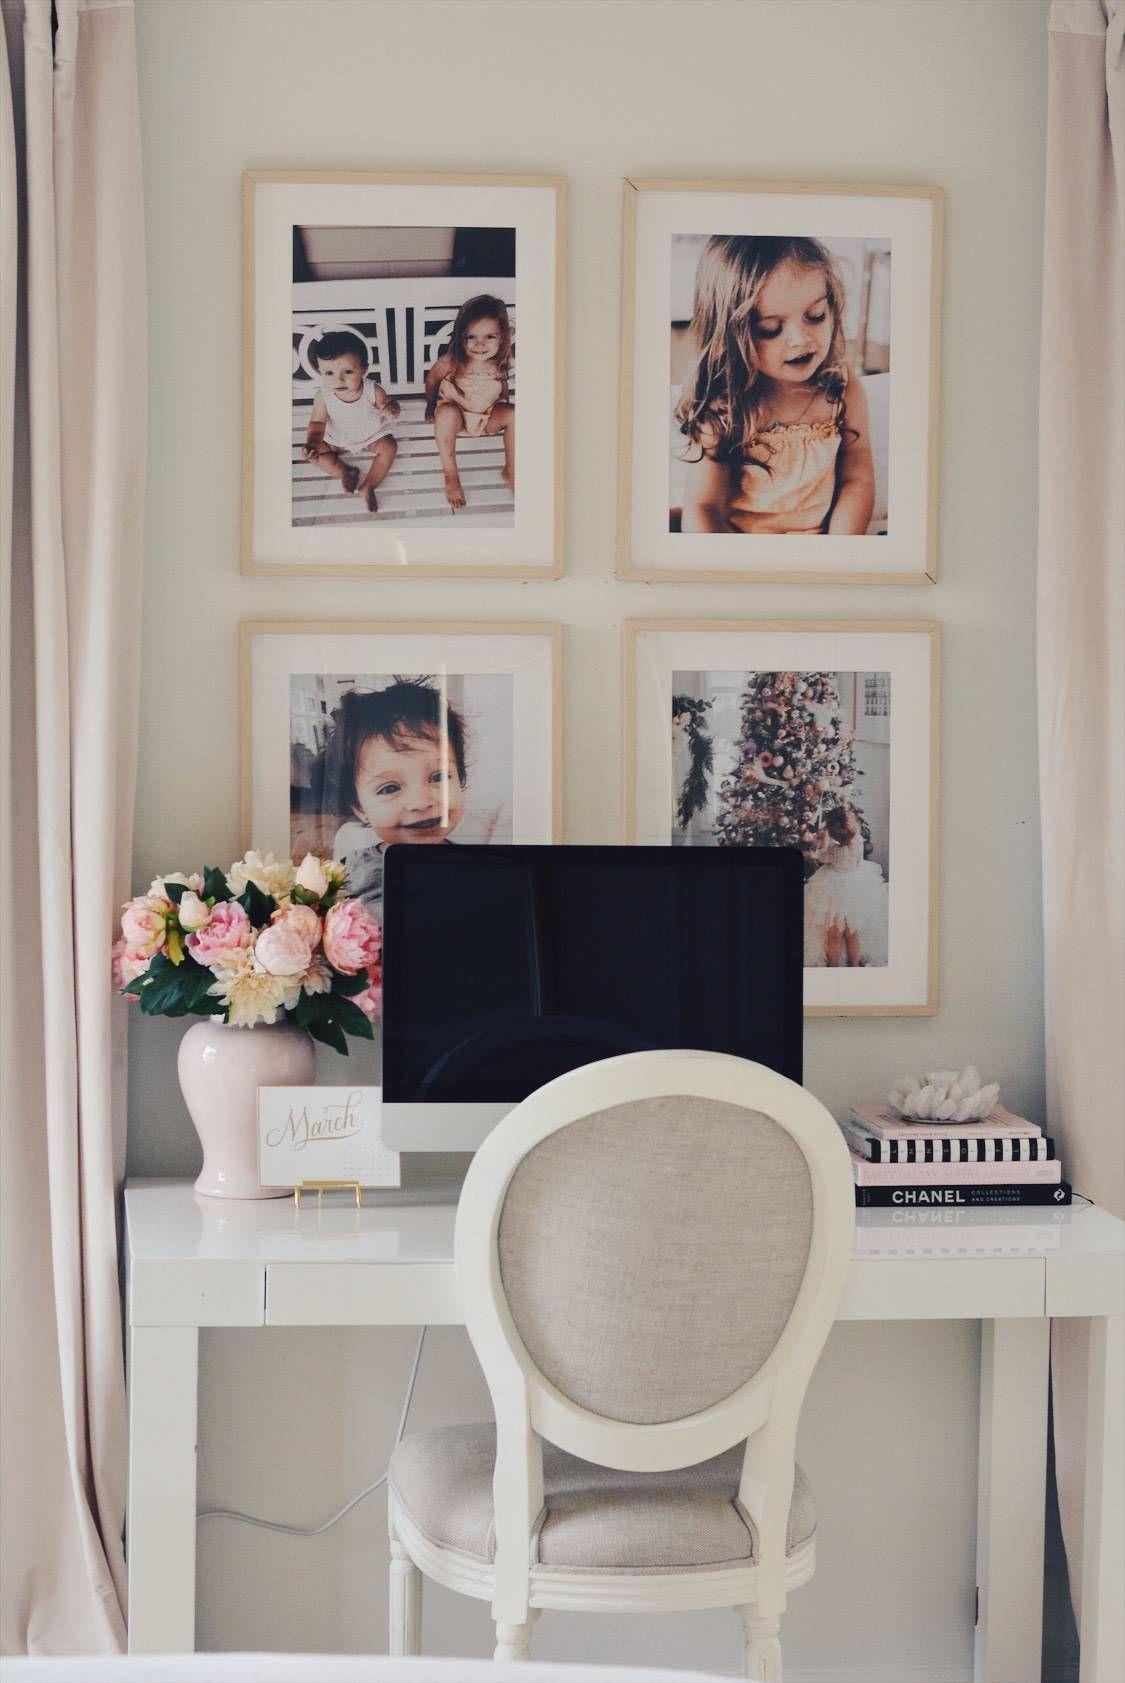 Ikea Hovsta Frames Creating A Family Gallery Wall Family